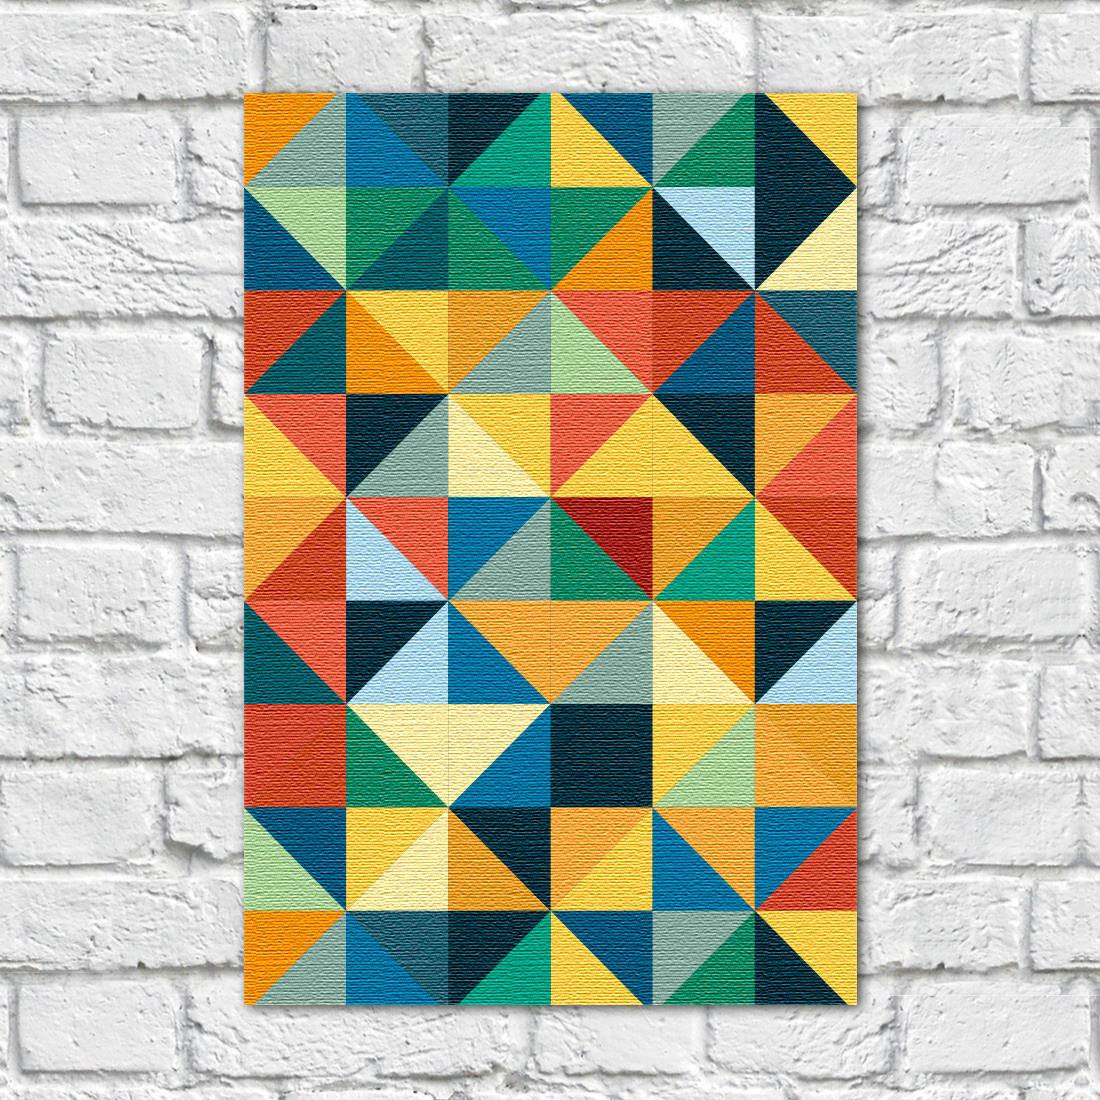 Quadro Decorativo Abstrato Colorido Em Canvas